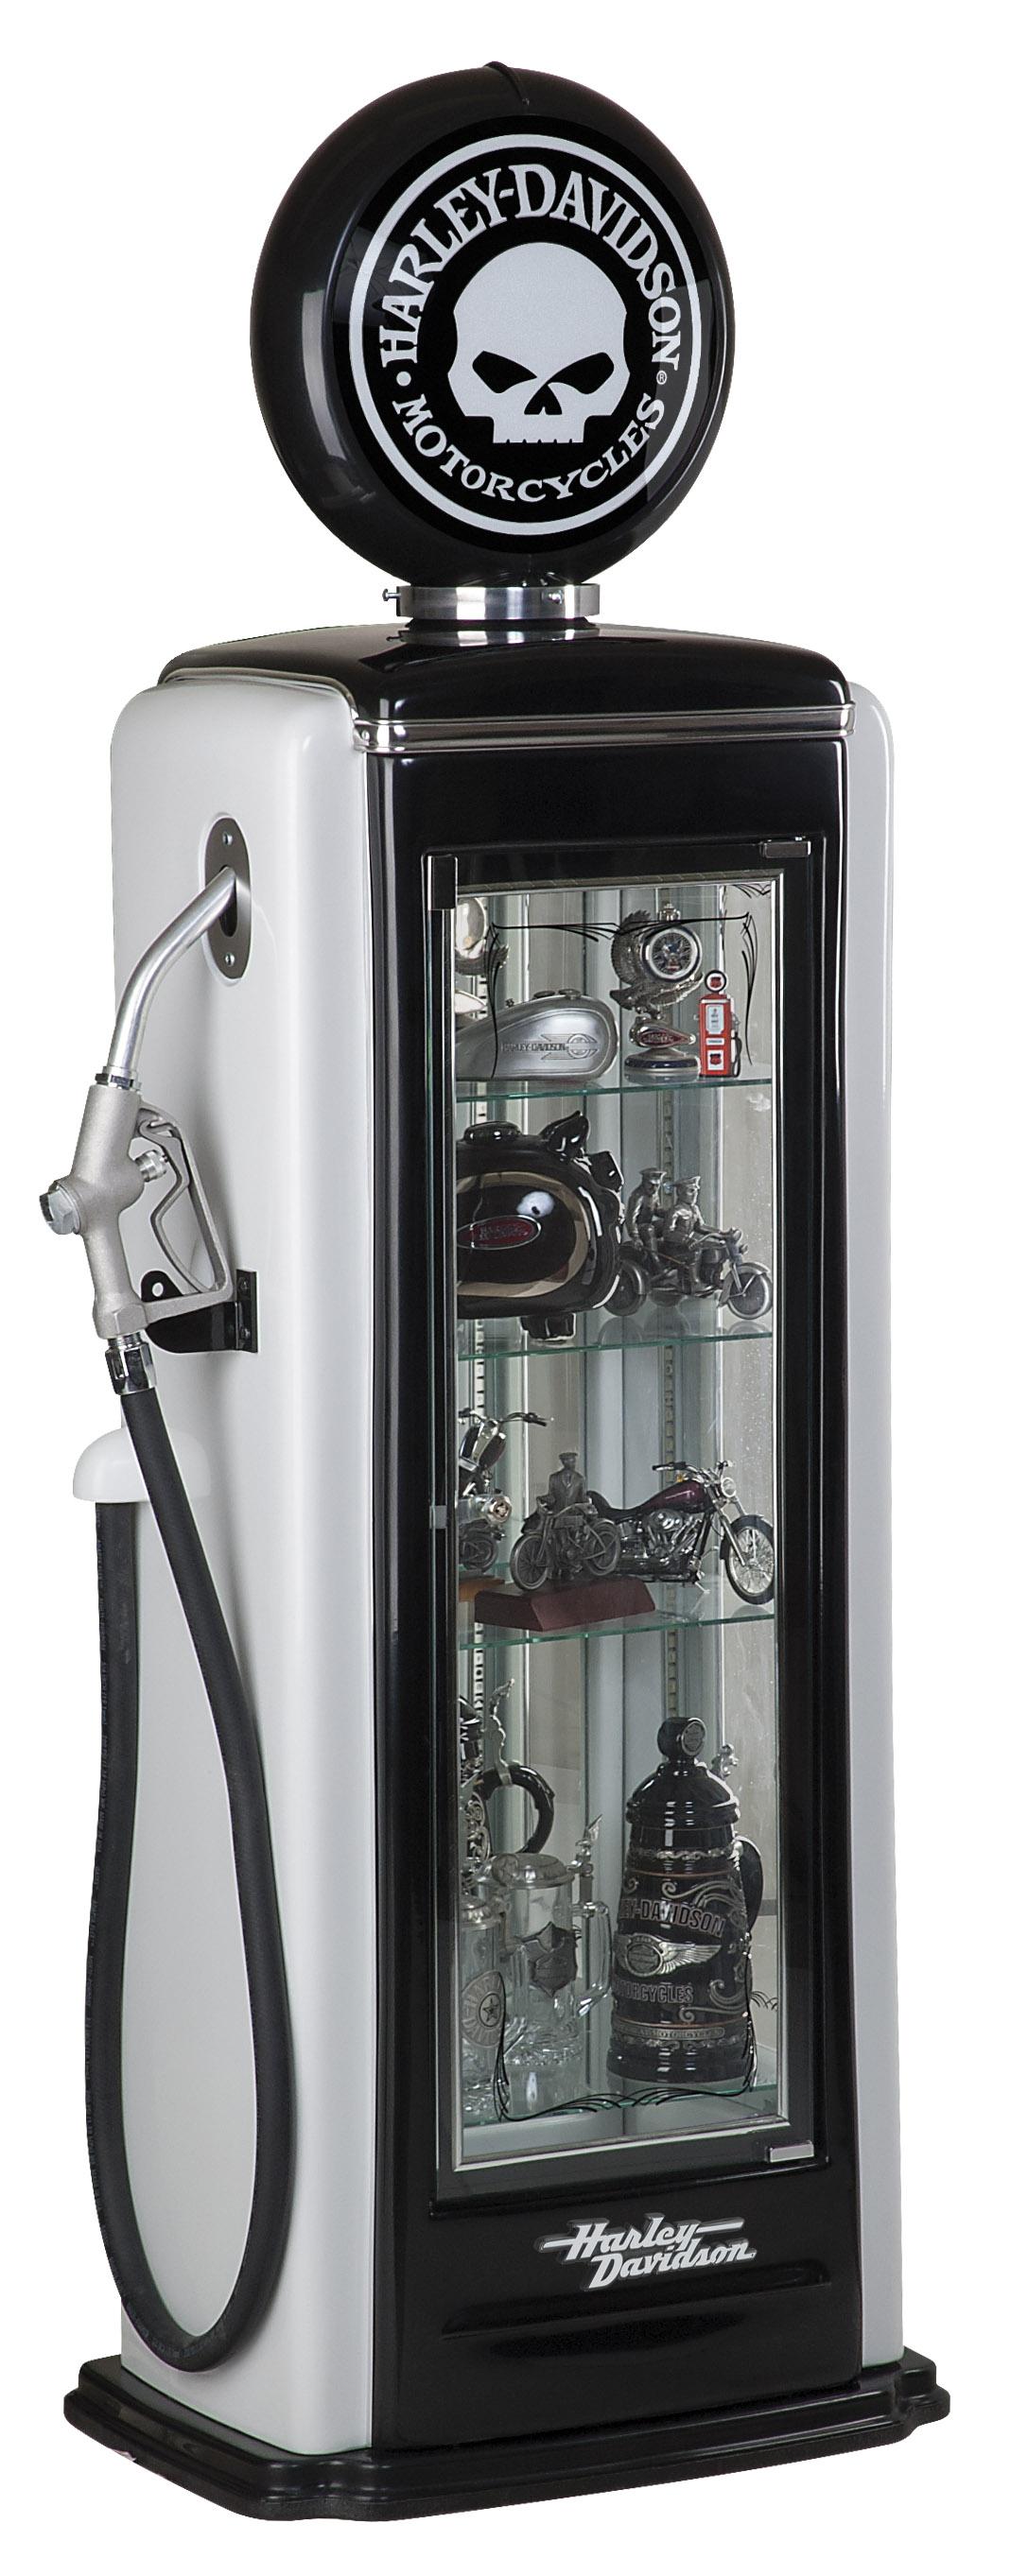 Harley Davidson Skull Gas Pump Display Case Hdl 19001